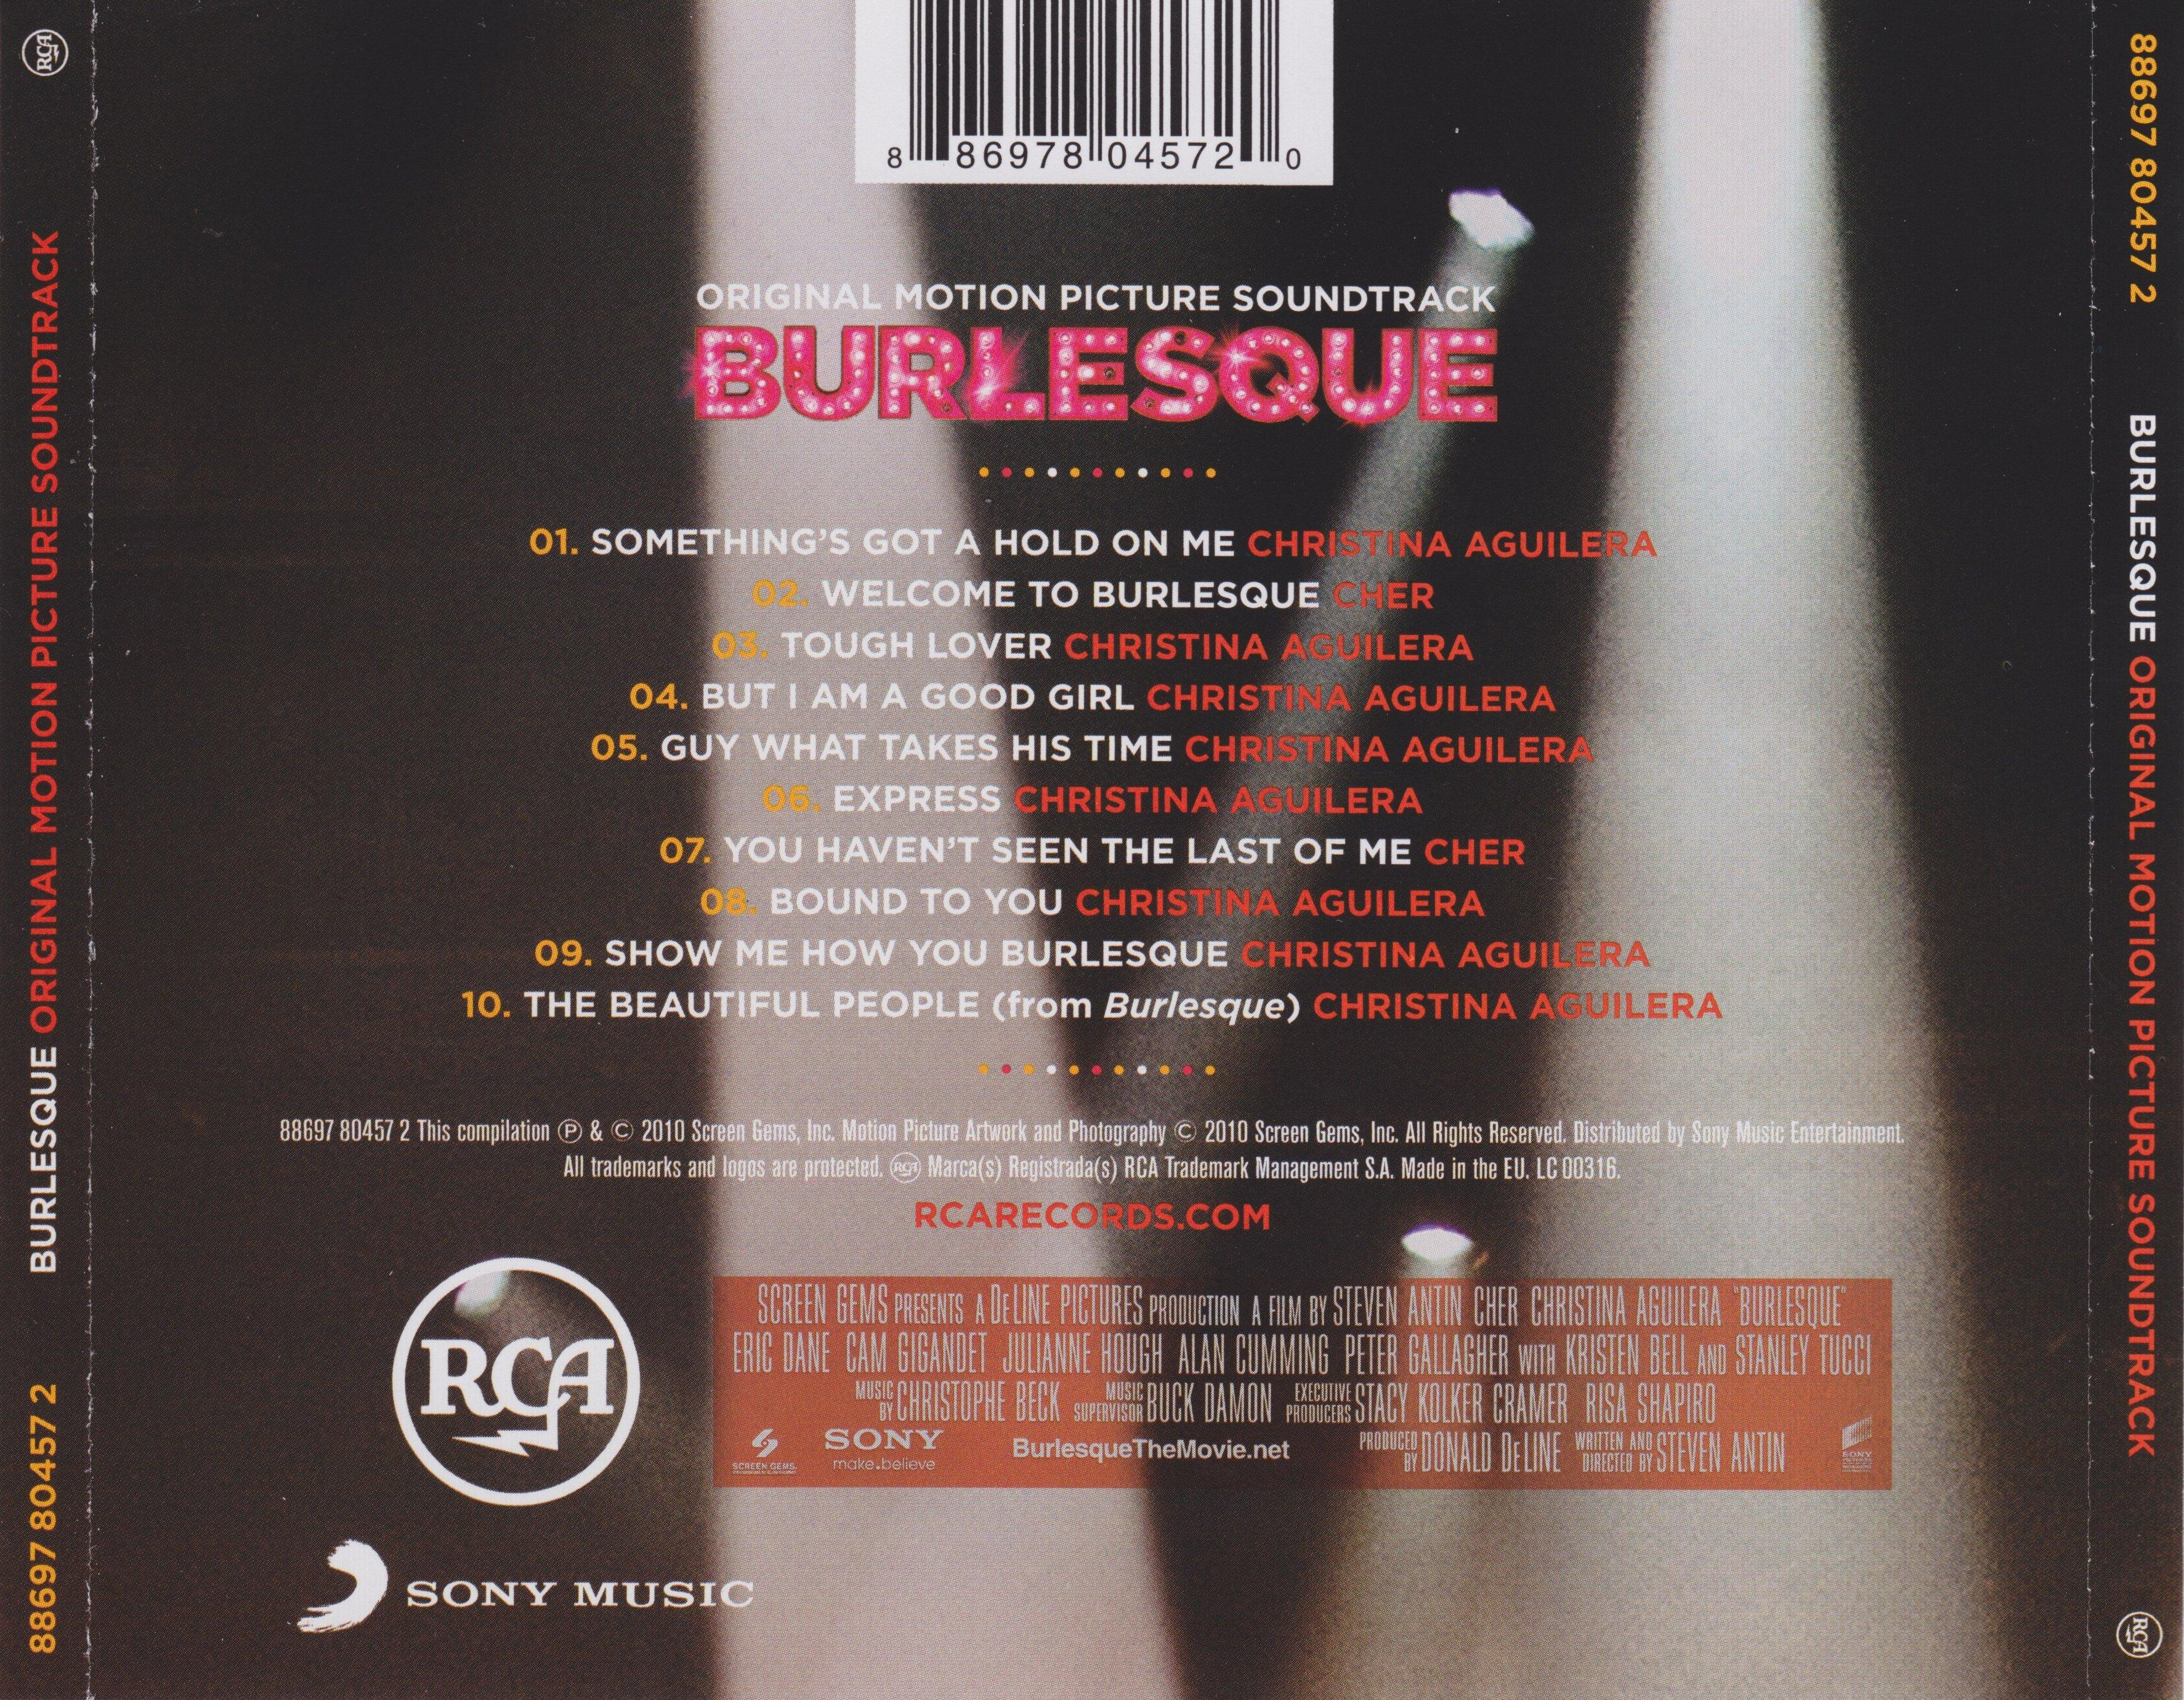 burlesque soundtrack